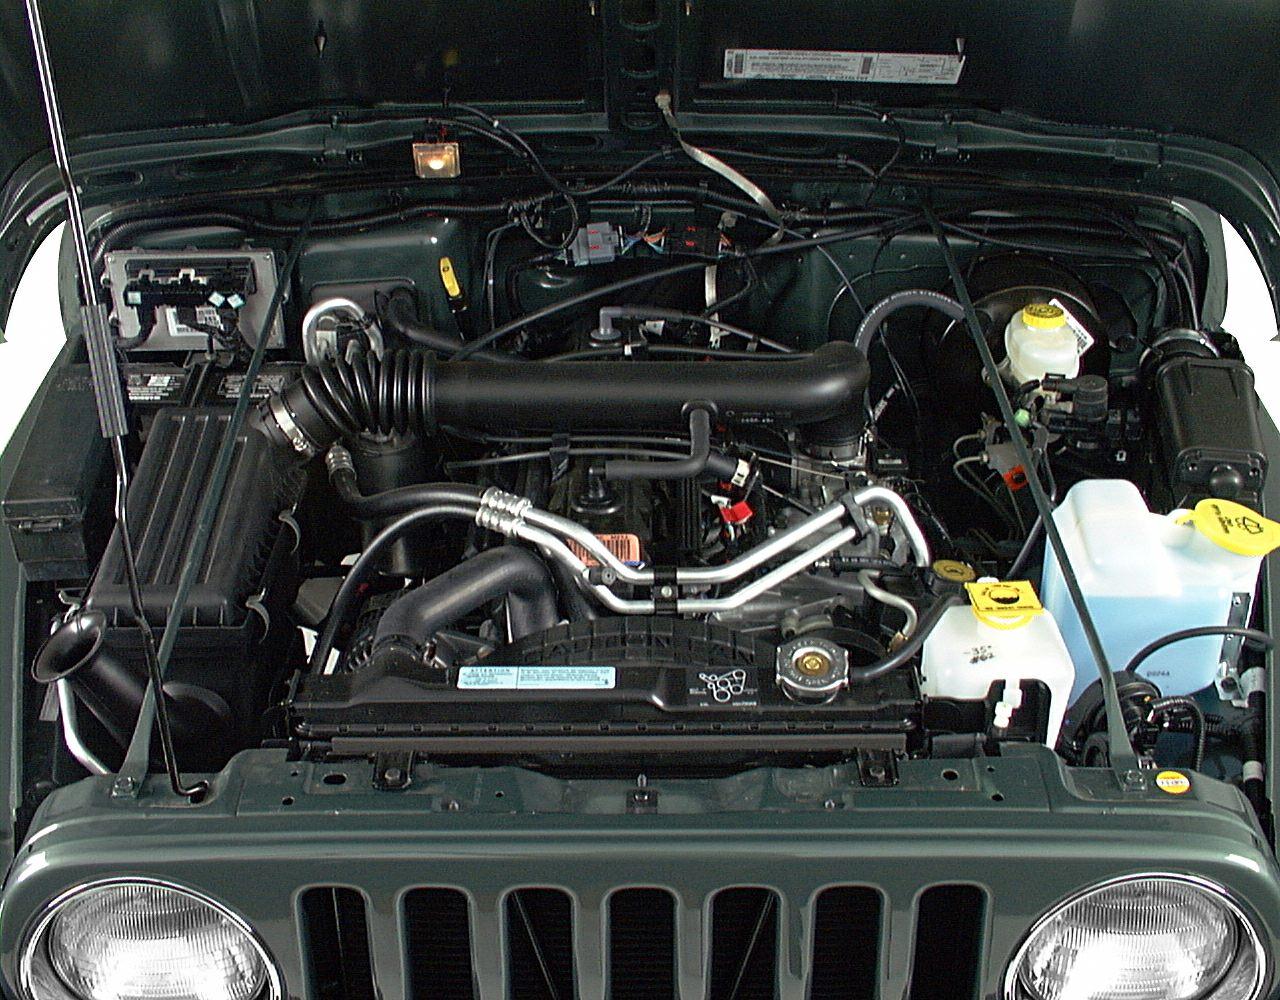 2000 Jeep Wrangler Exterior Photo